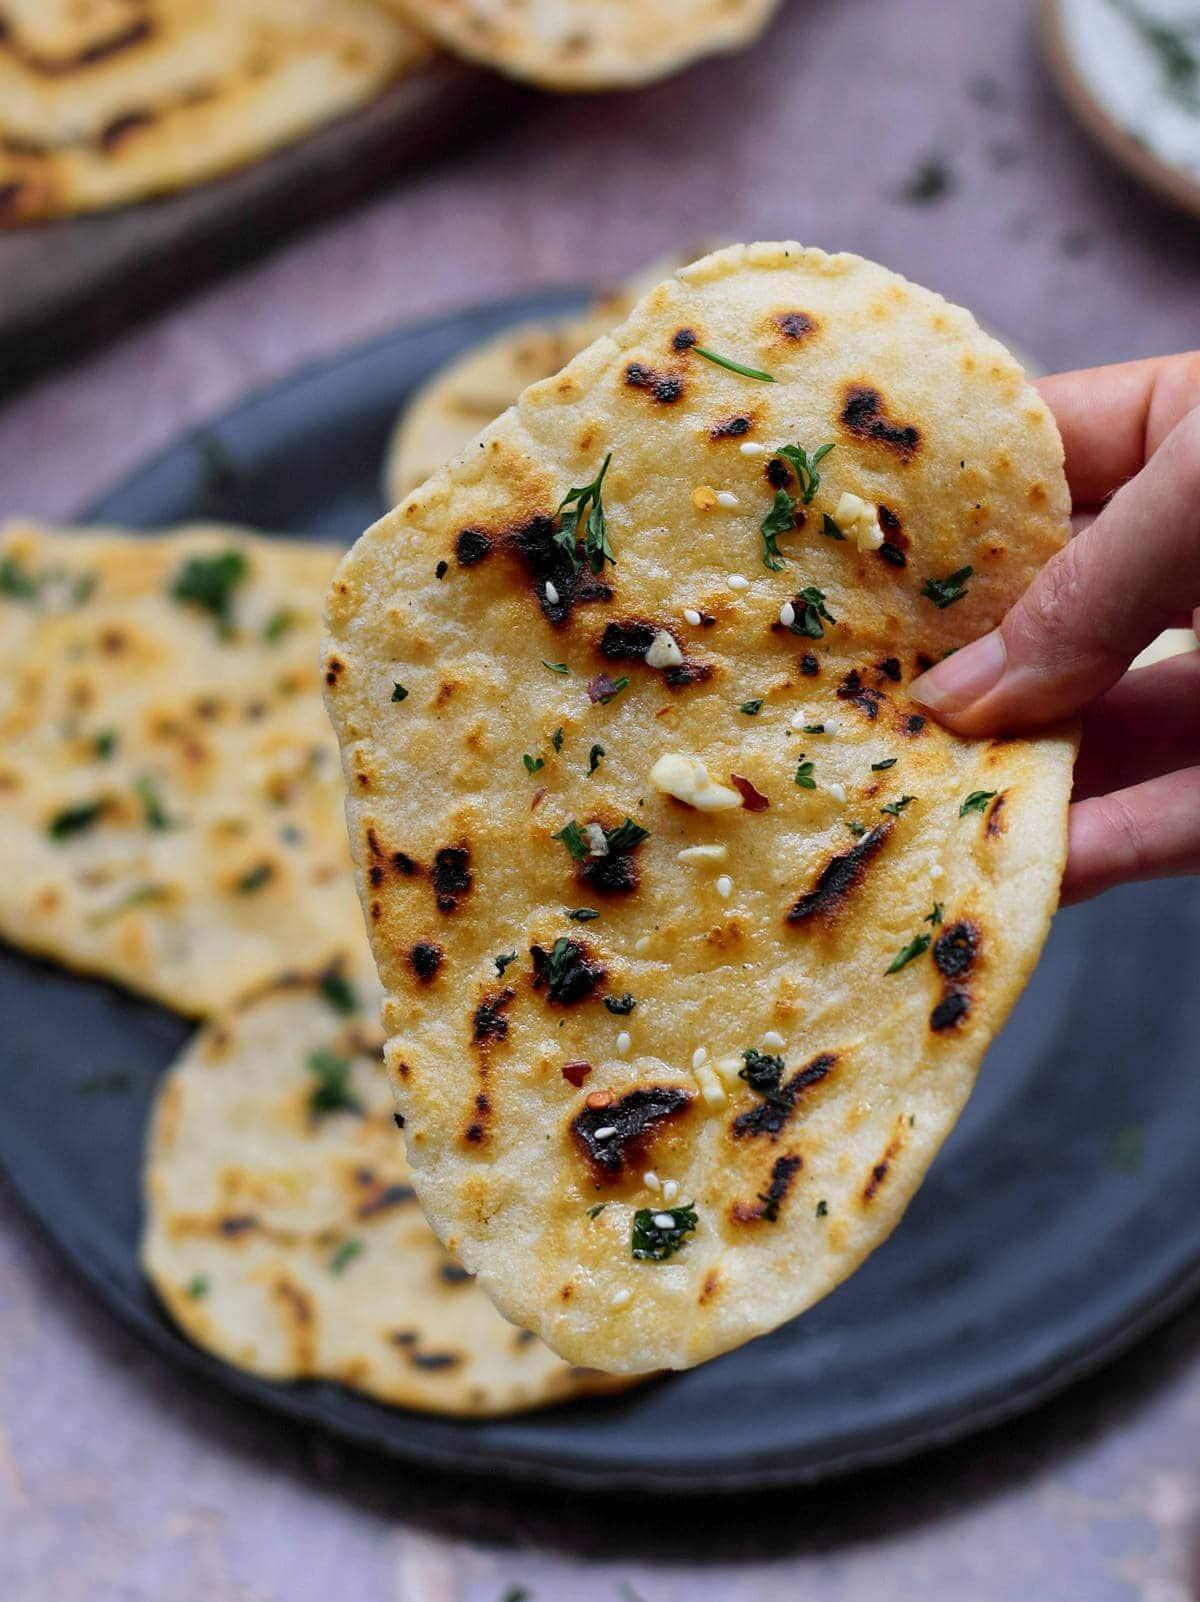 hand holding one vegan gluten-free homemade flatbread with garlic